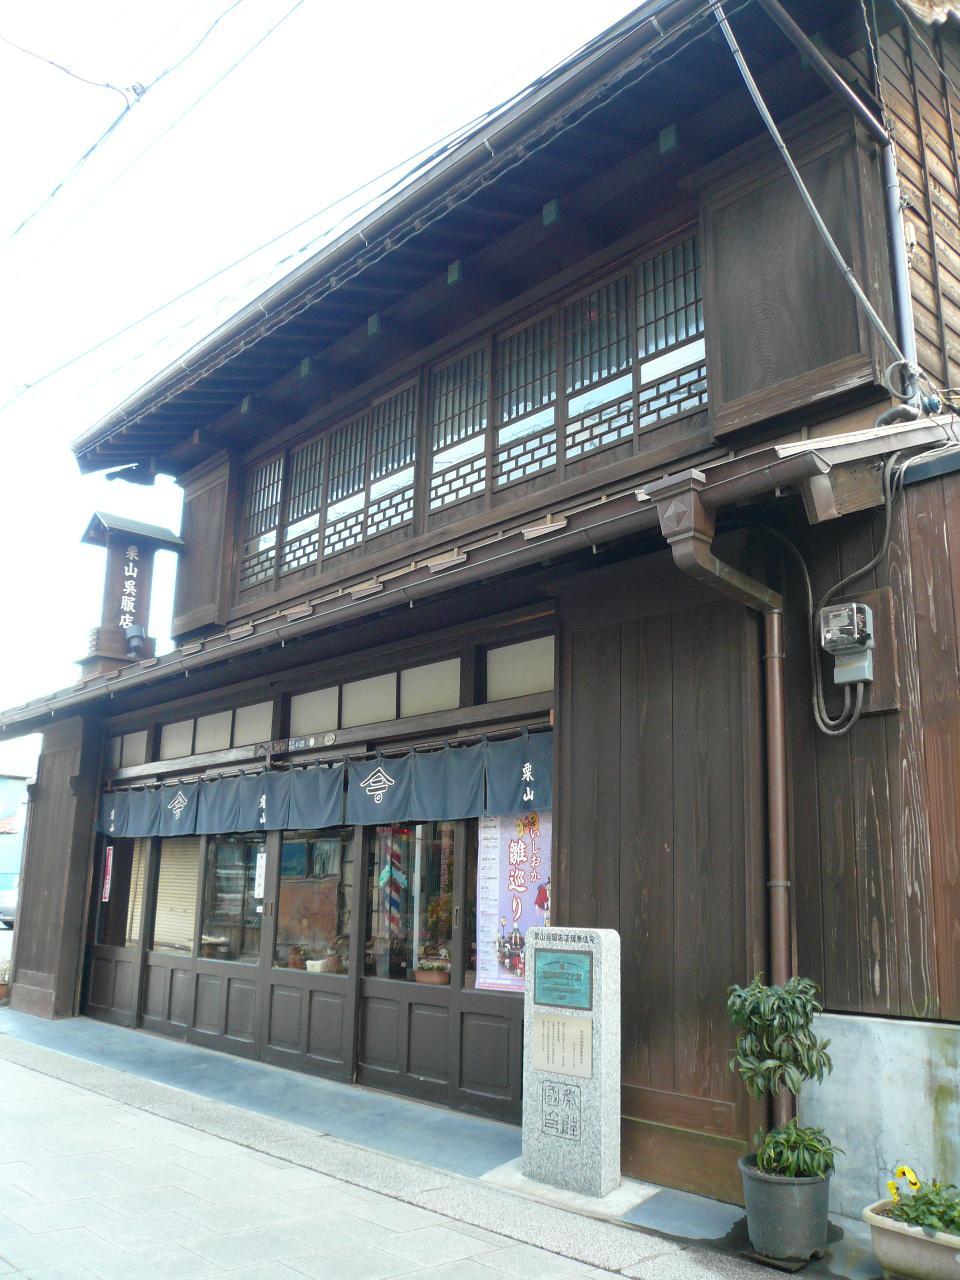 【SUUMO】 [賃貸・店舗併用住宅を建てたい]から …